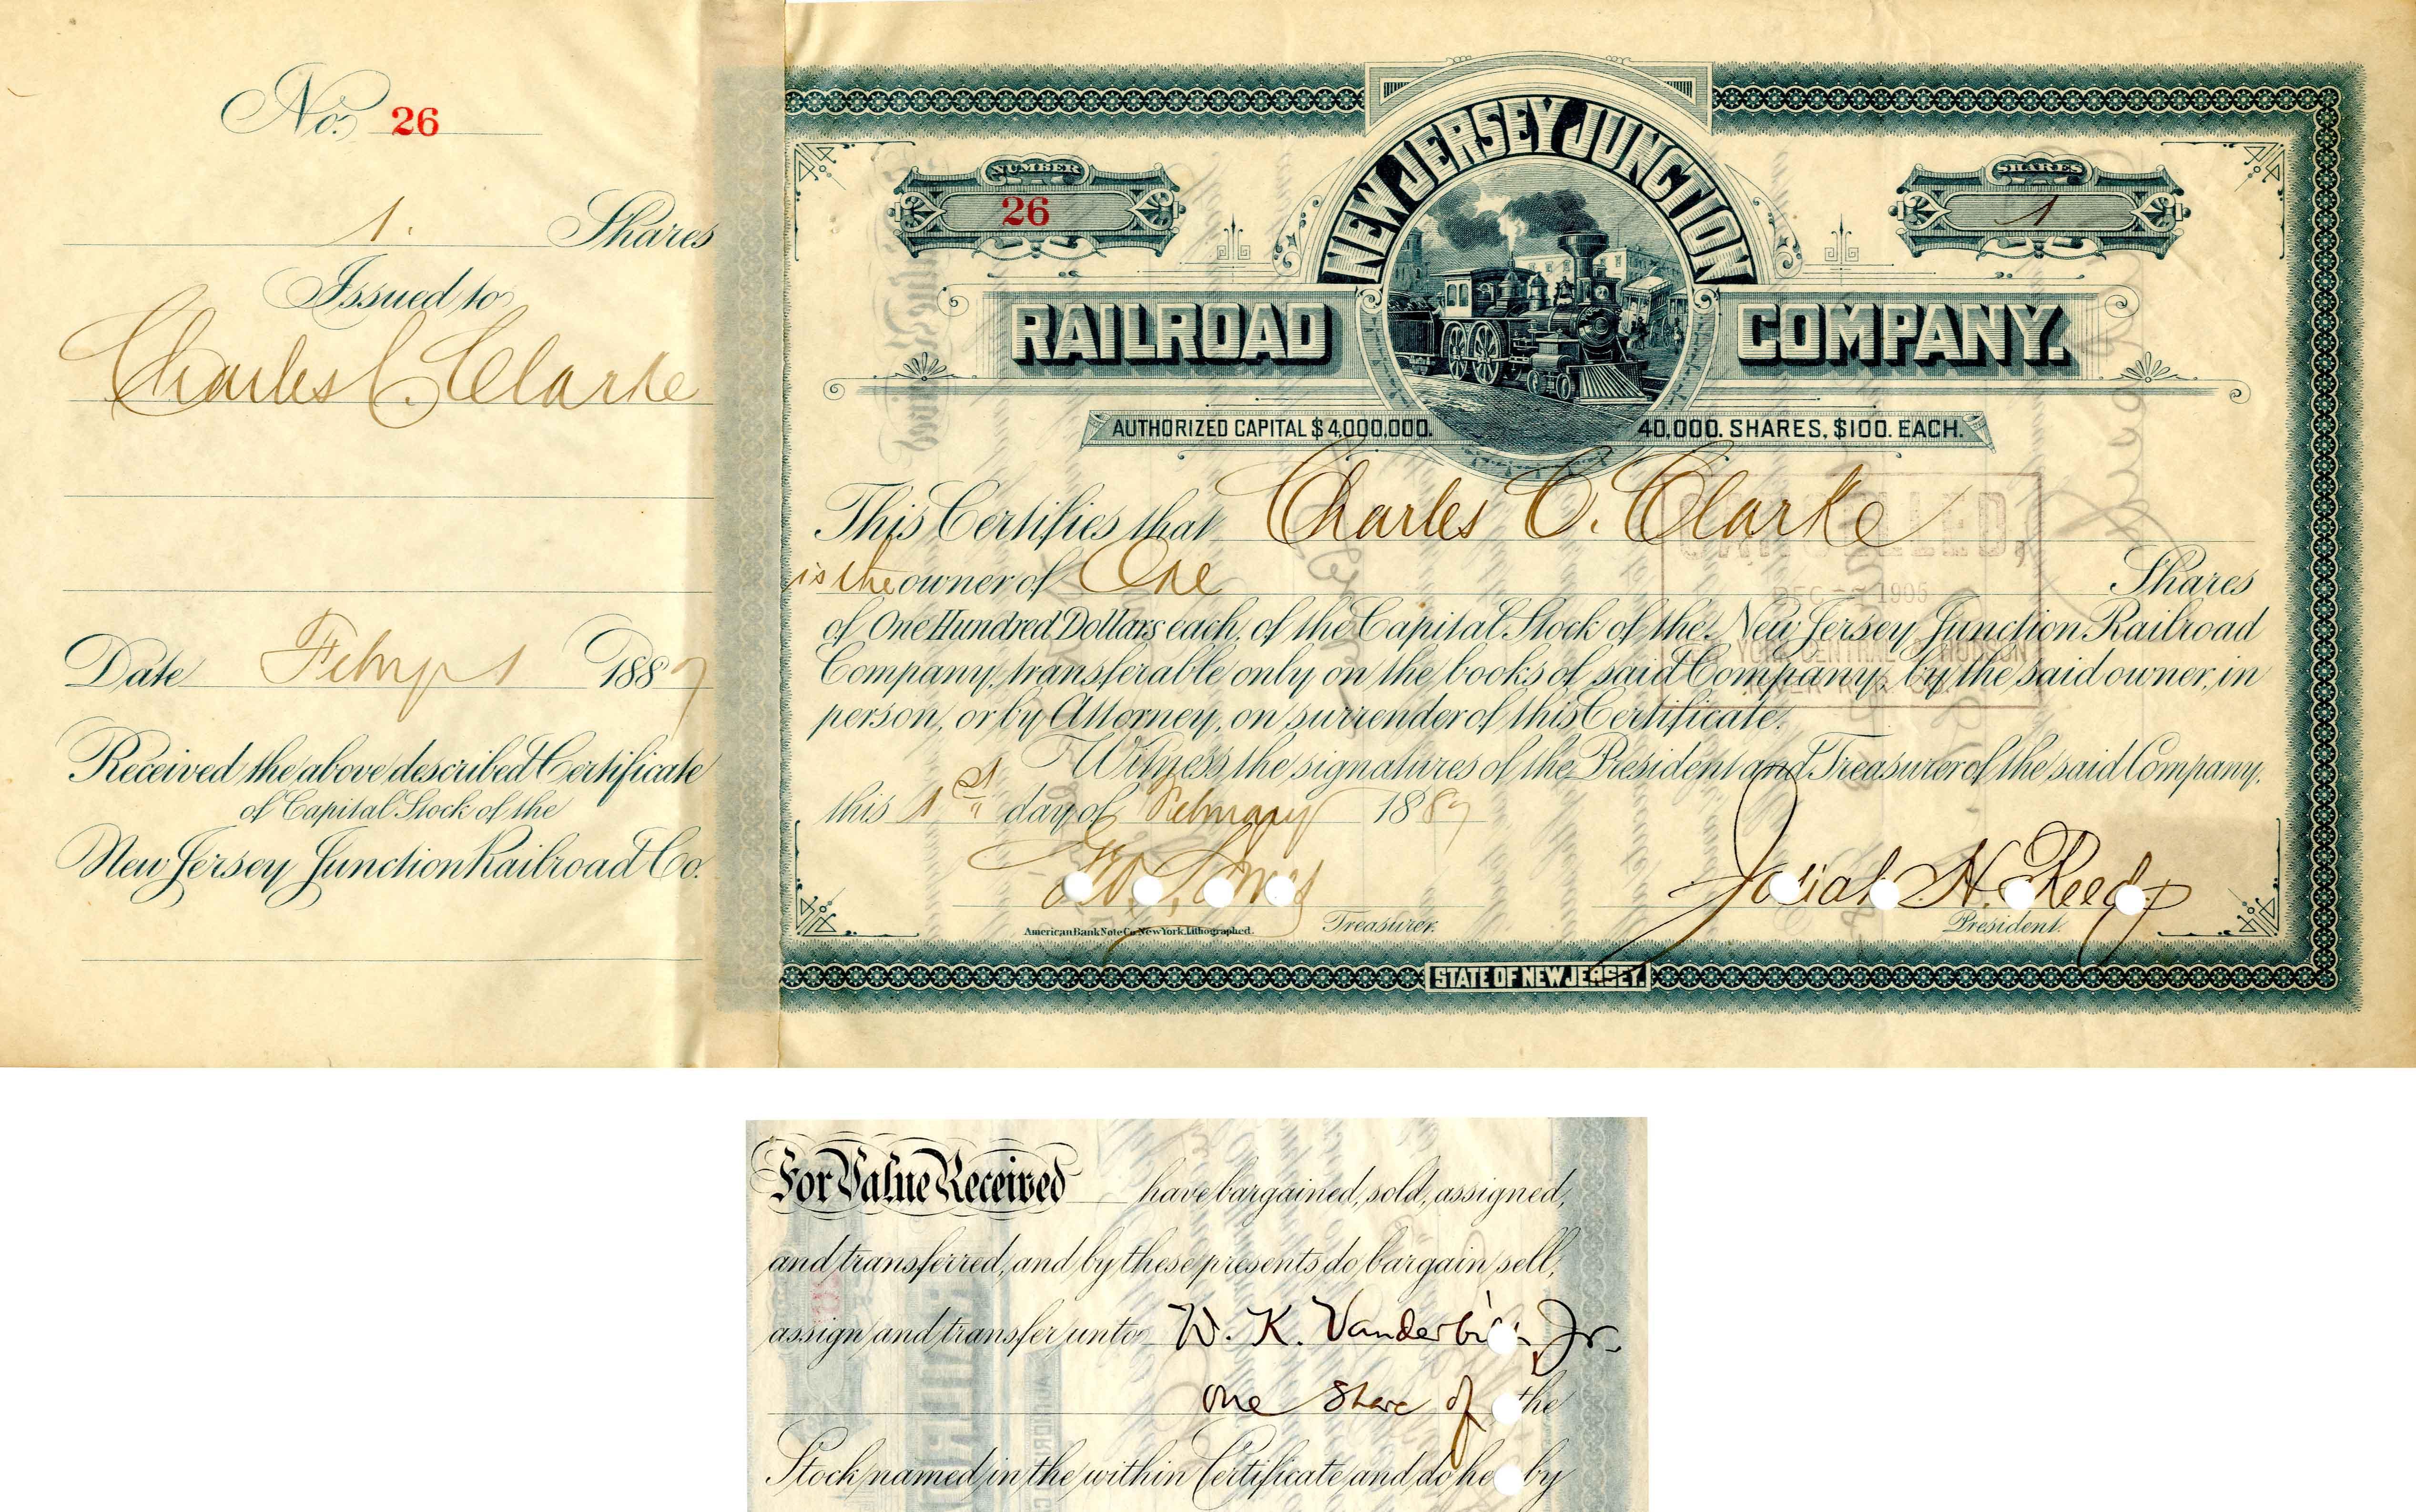 New Jersey Junction Railroad Company transferred to Wm. K. Vanderbilt Jr.